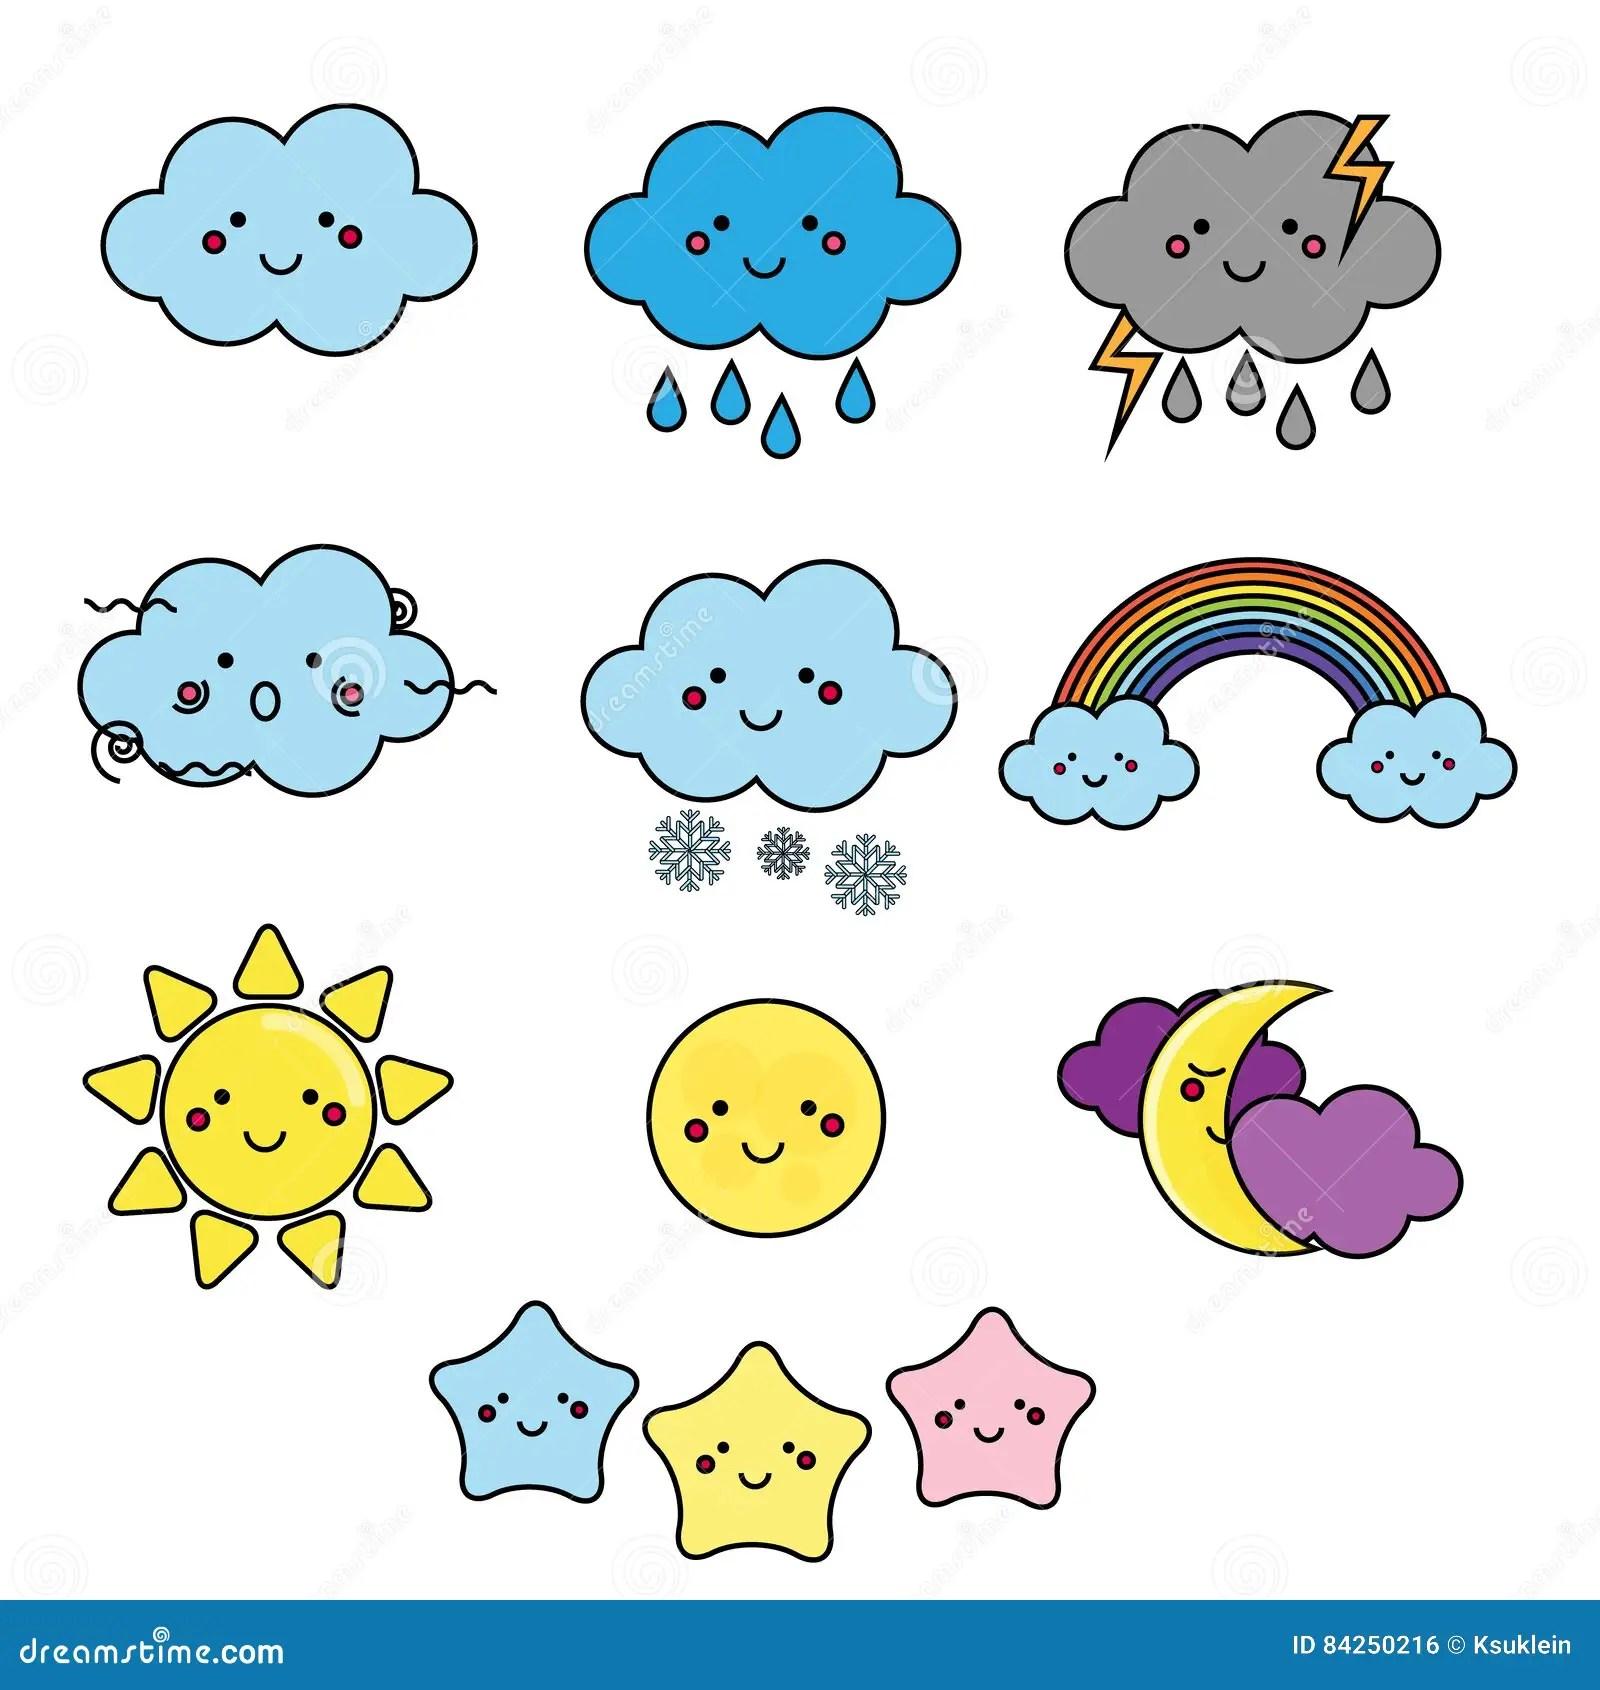 Rain Cloud Worksheet